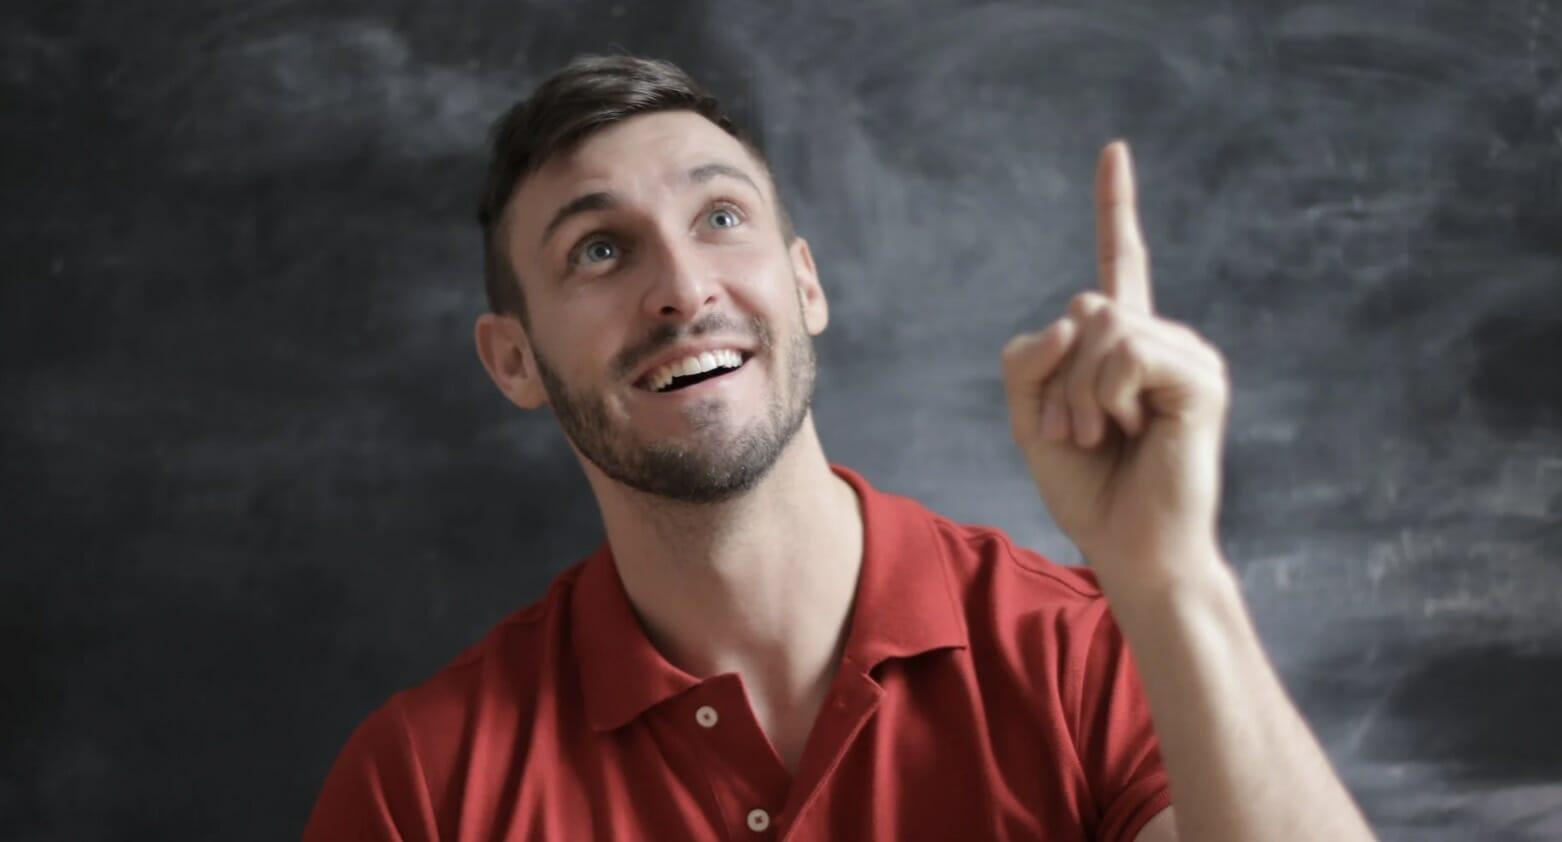 man pointing upward in realization